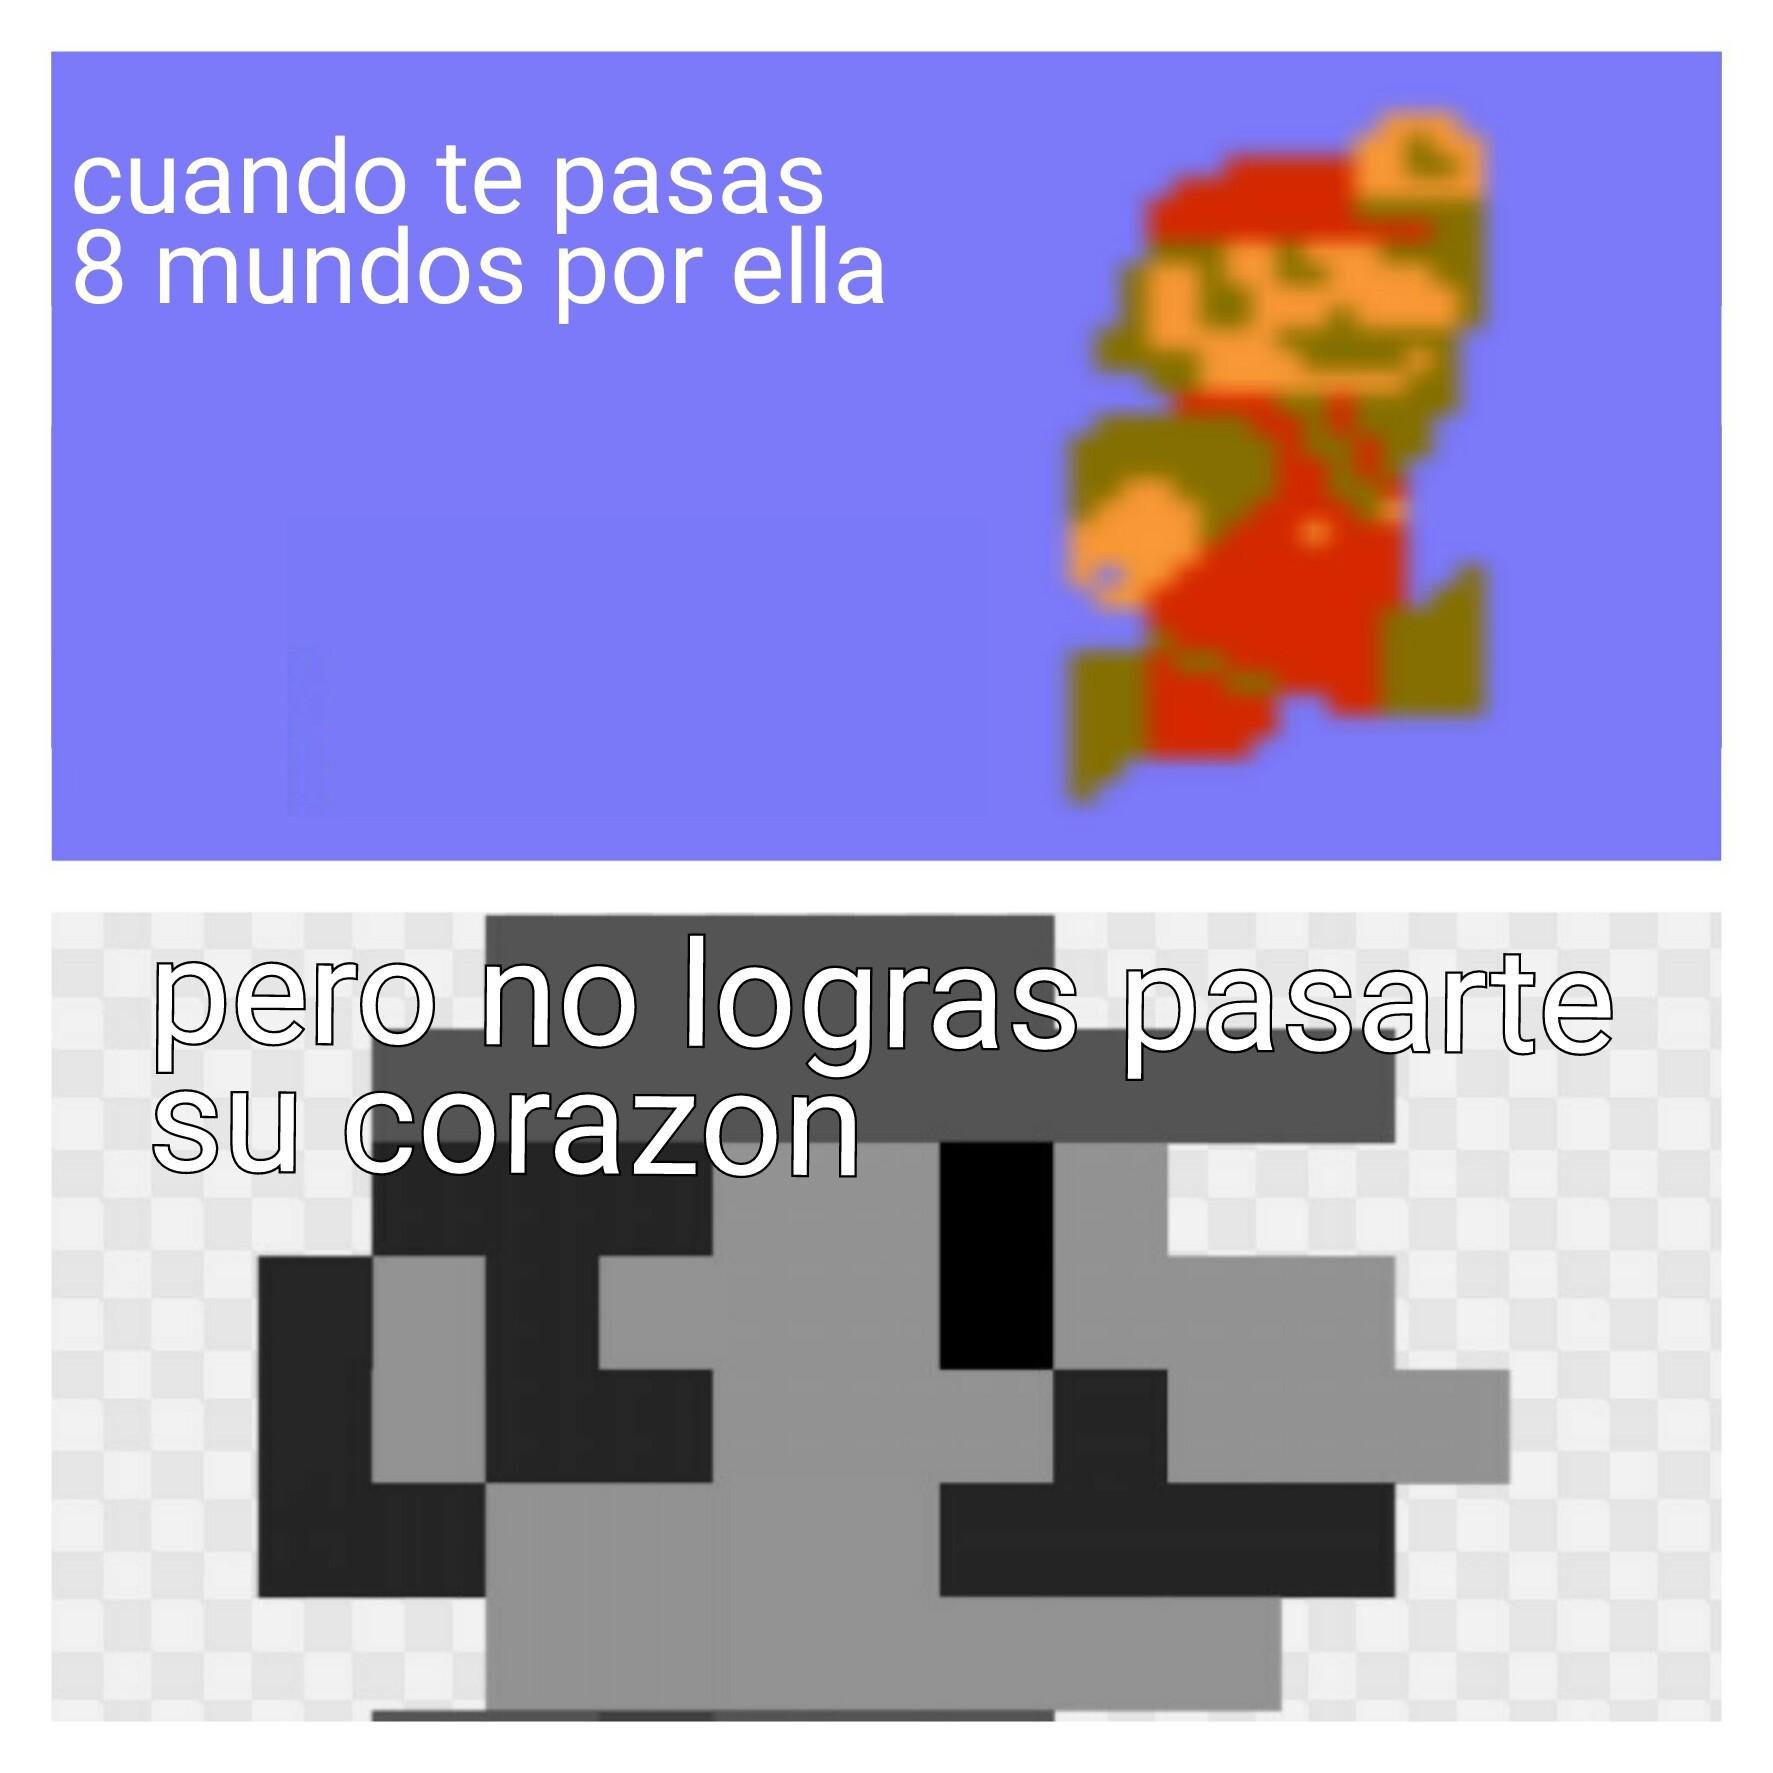 Baiabaia - meme